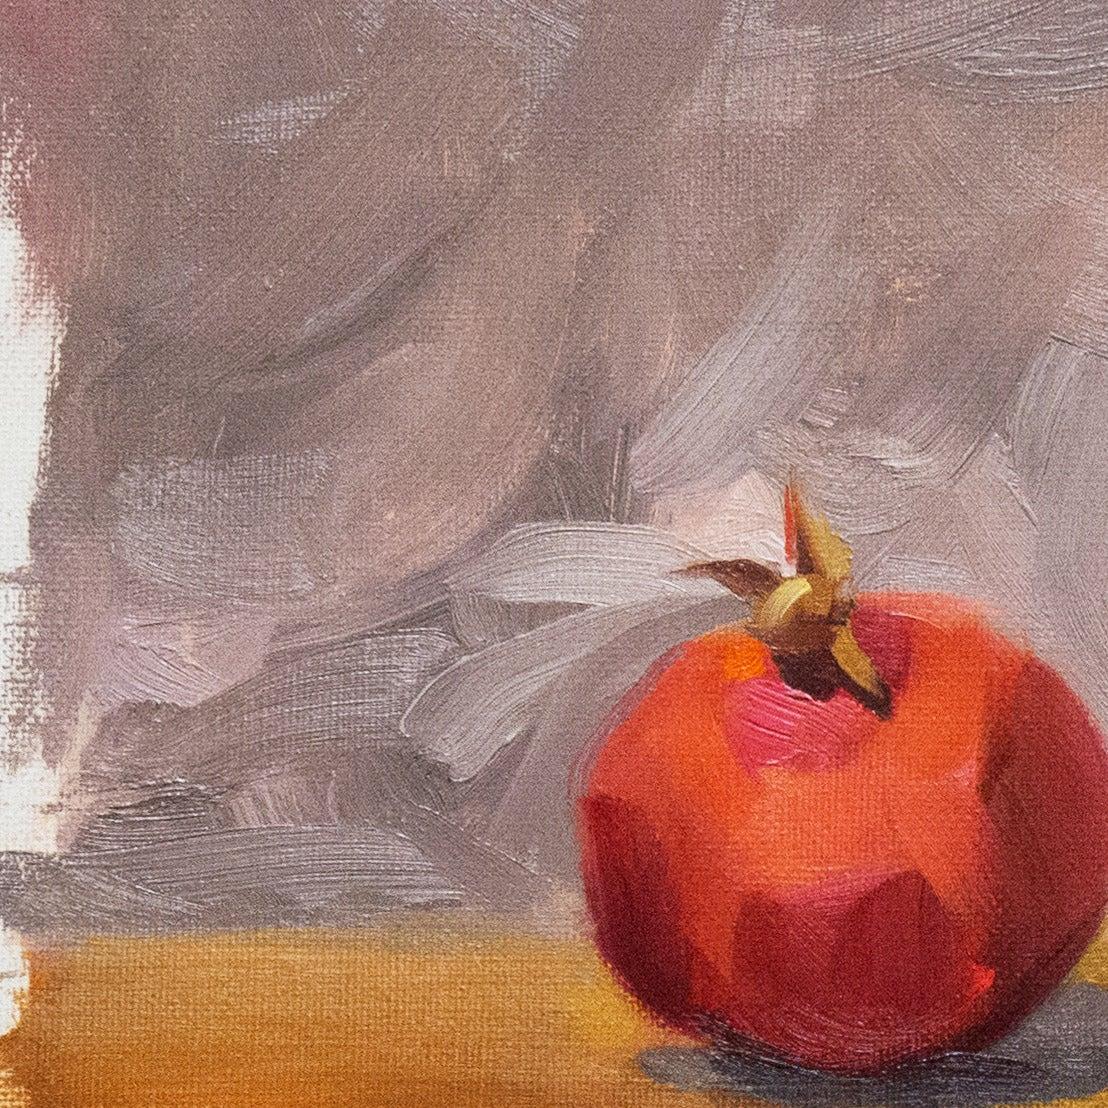 'Still Life with Pomegranates', California woman artist, Carmel Art Association - Red Still-Life Painting by Carole Minou